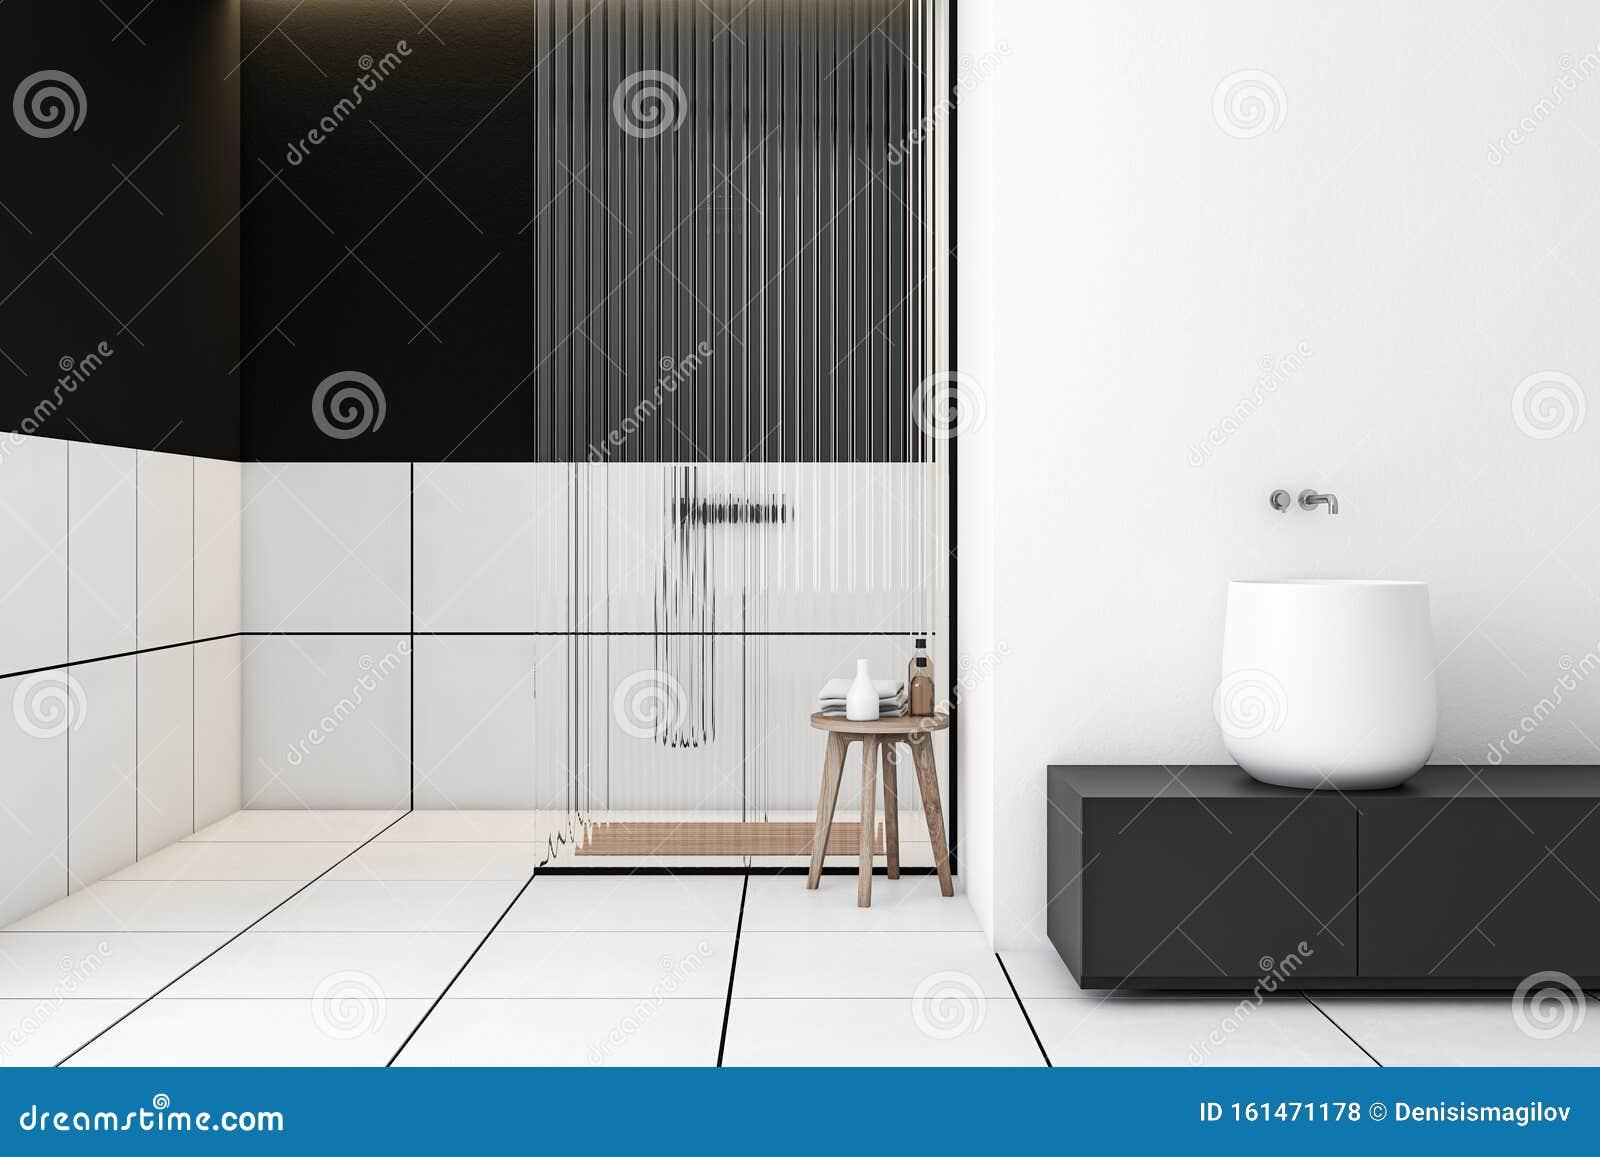 White And Black Tile Bathroom With Sink And Shower Stock Illustration Illustration Of Bowl Black 161471178